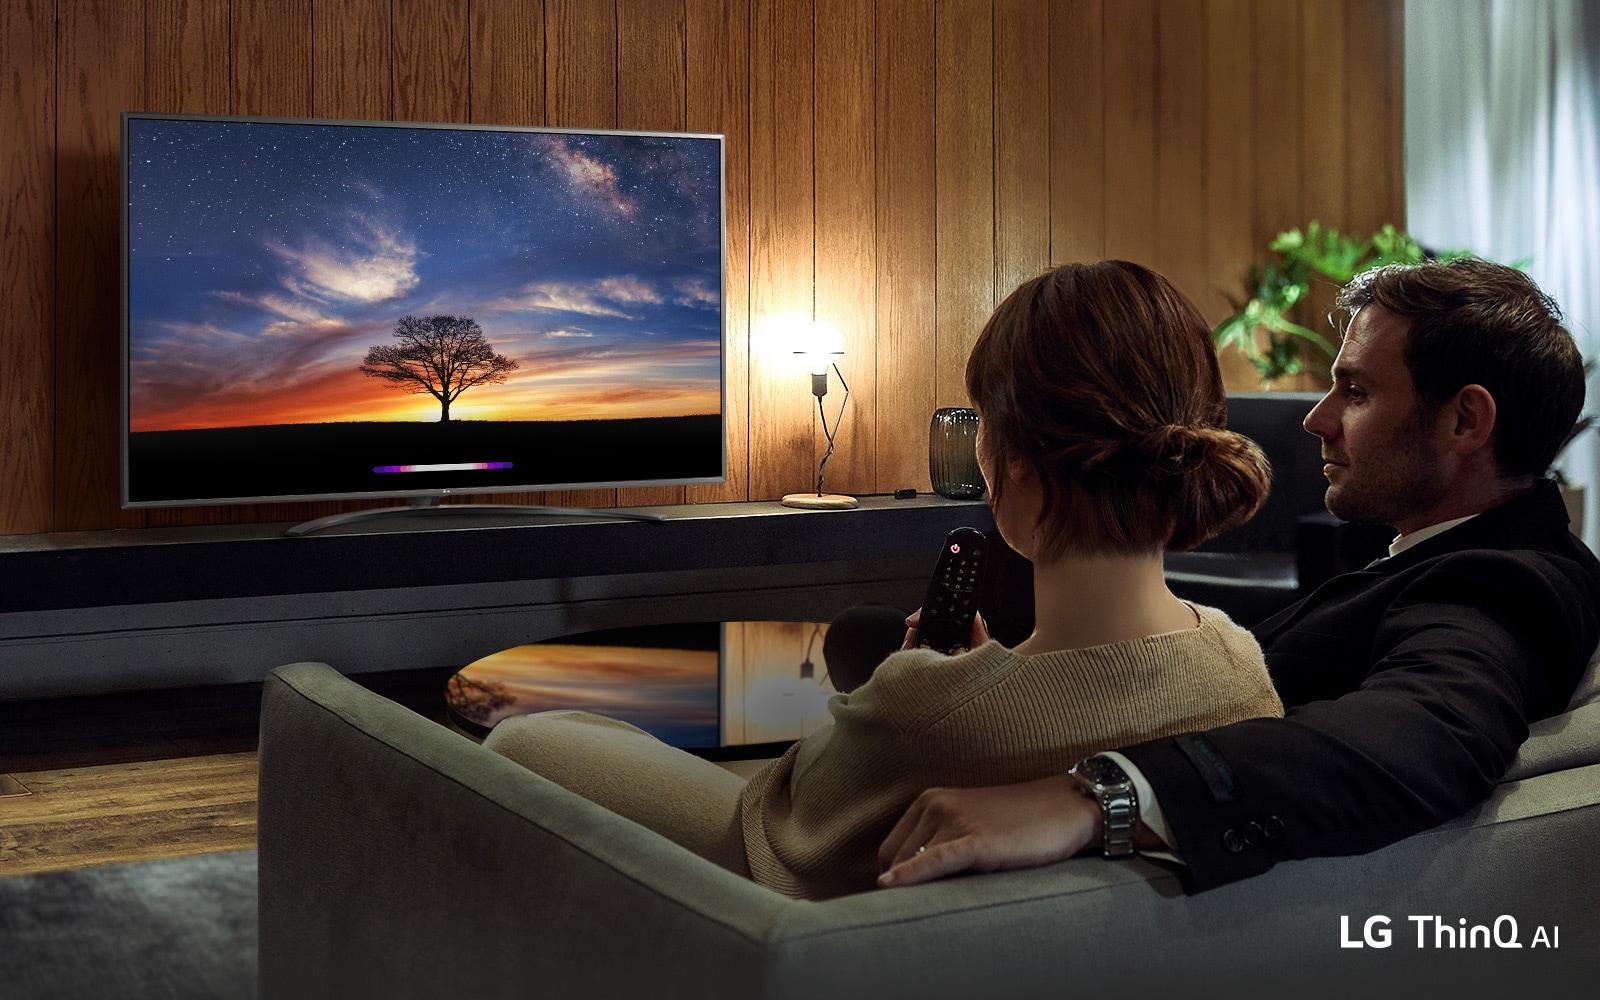 TV-UHD-70-UM71-01-AI-ThinQ-Desktop